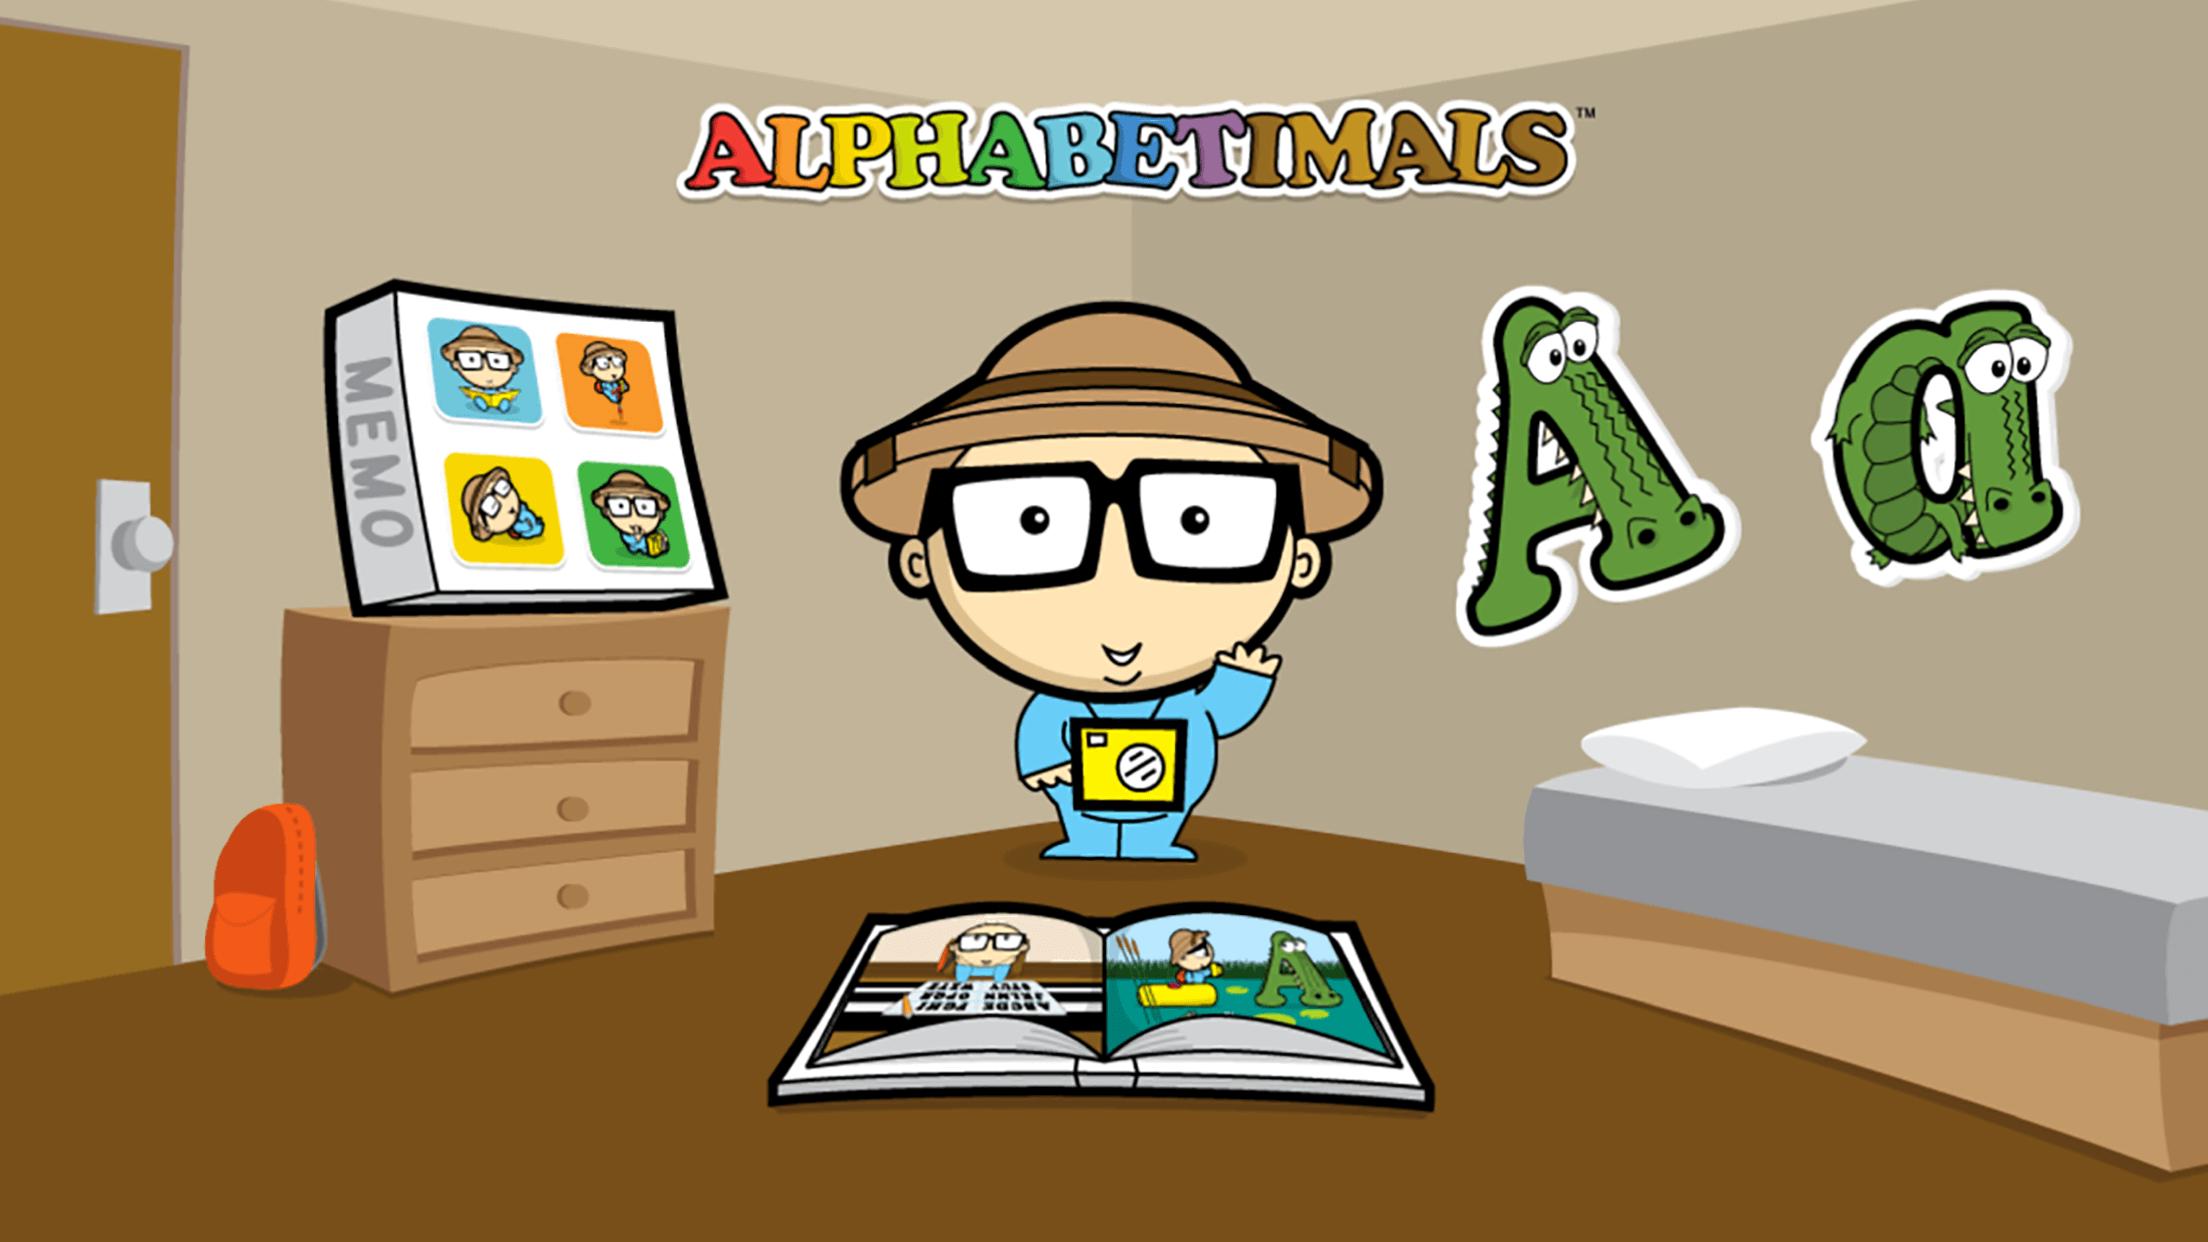 Alphabetimals App Home Screen